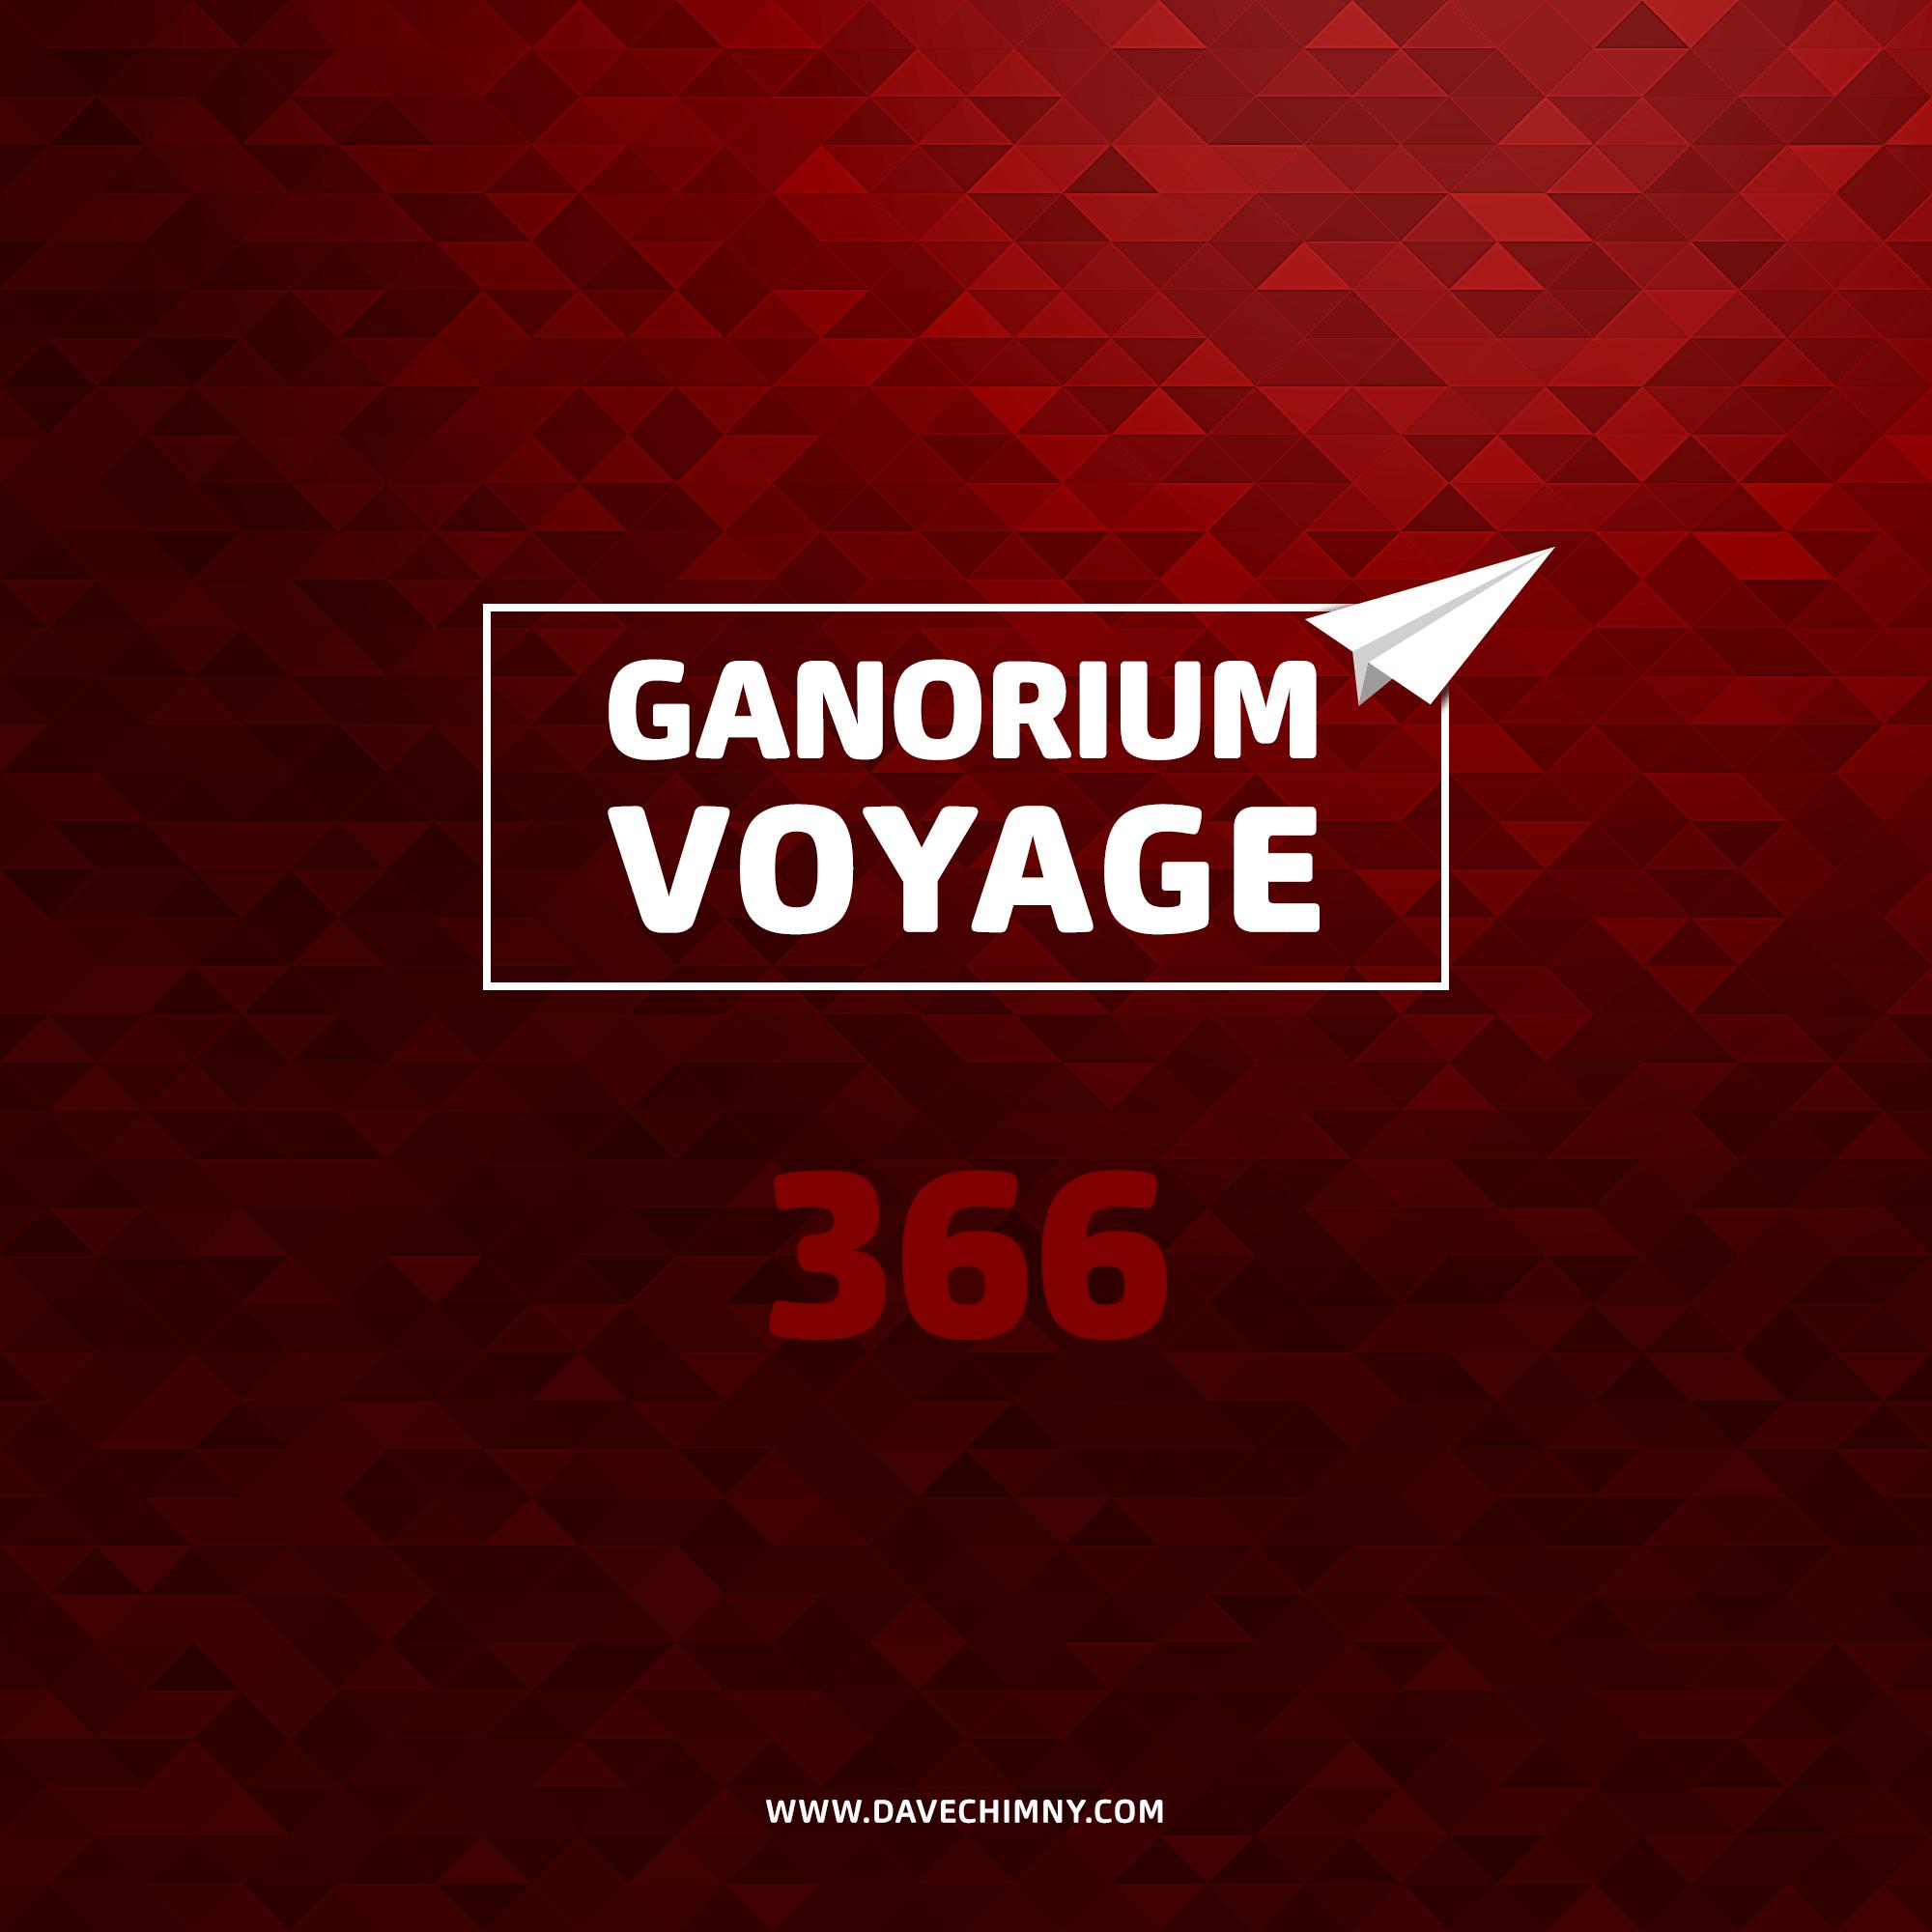 Dave Chimny – Ganorium Voyage 366